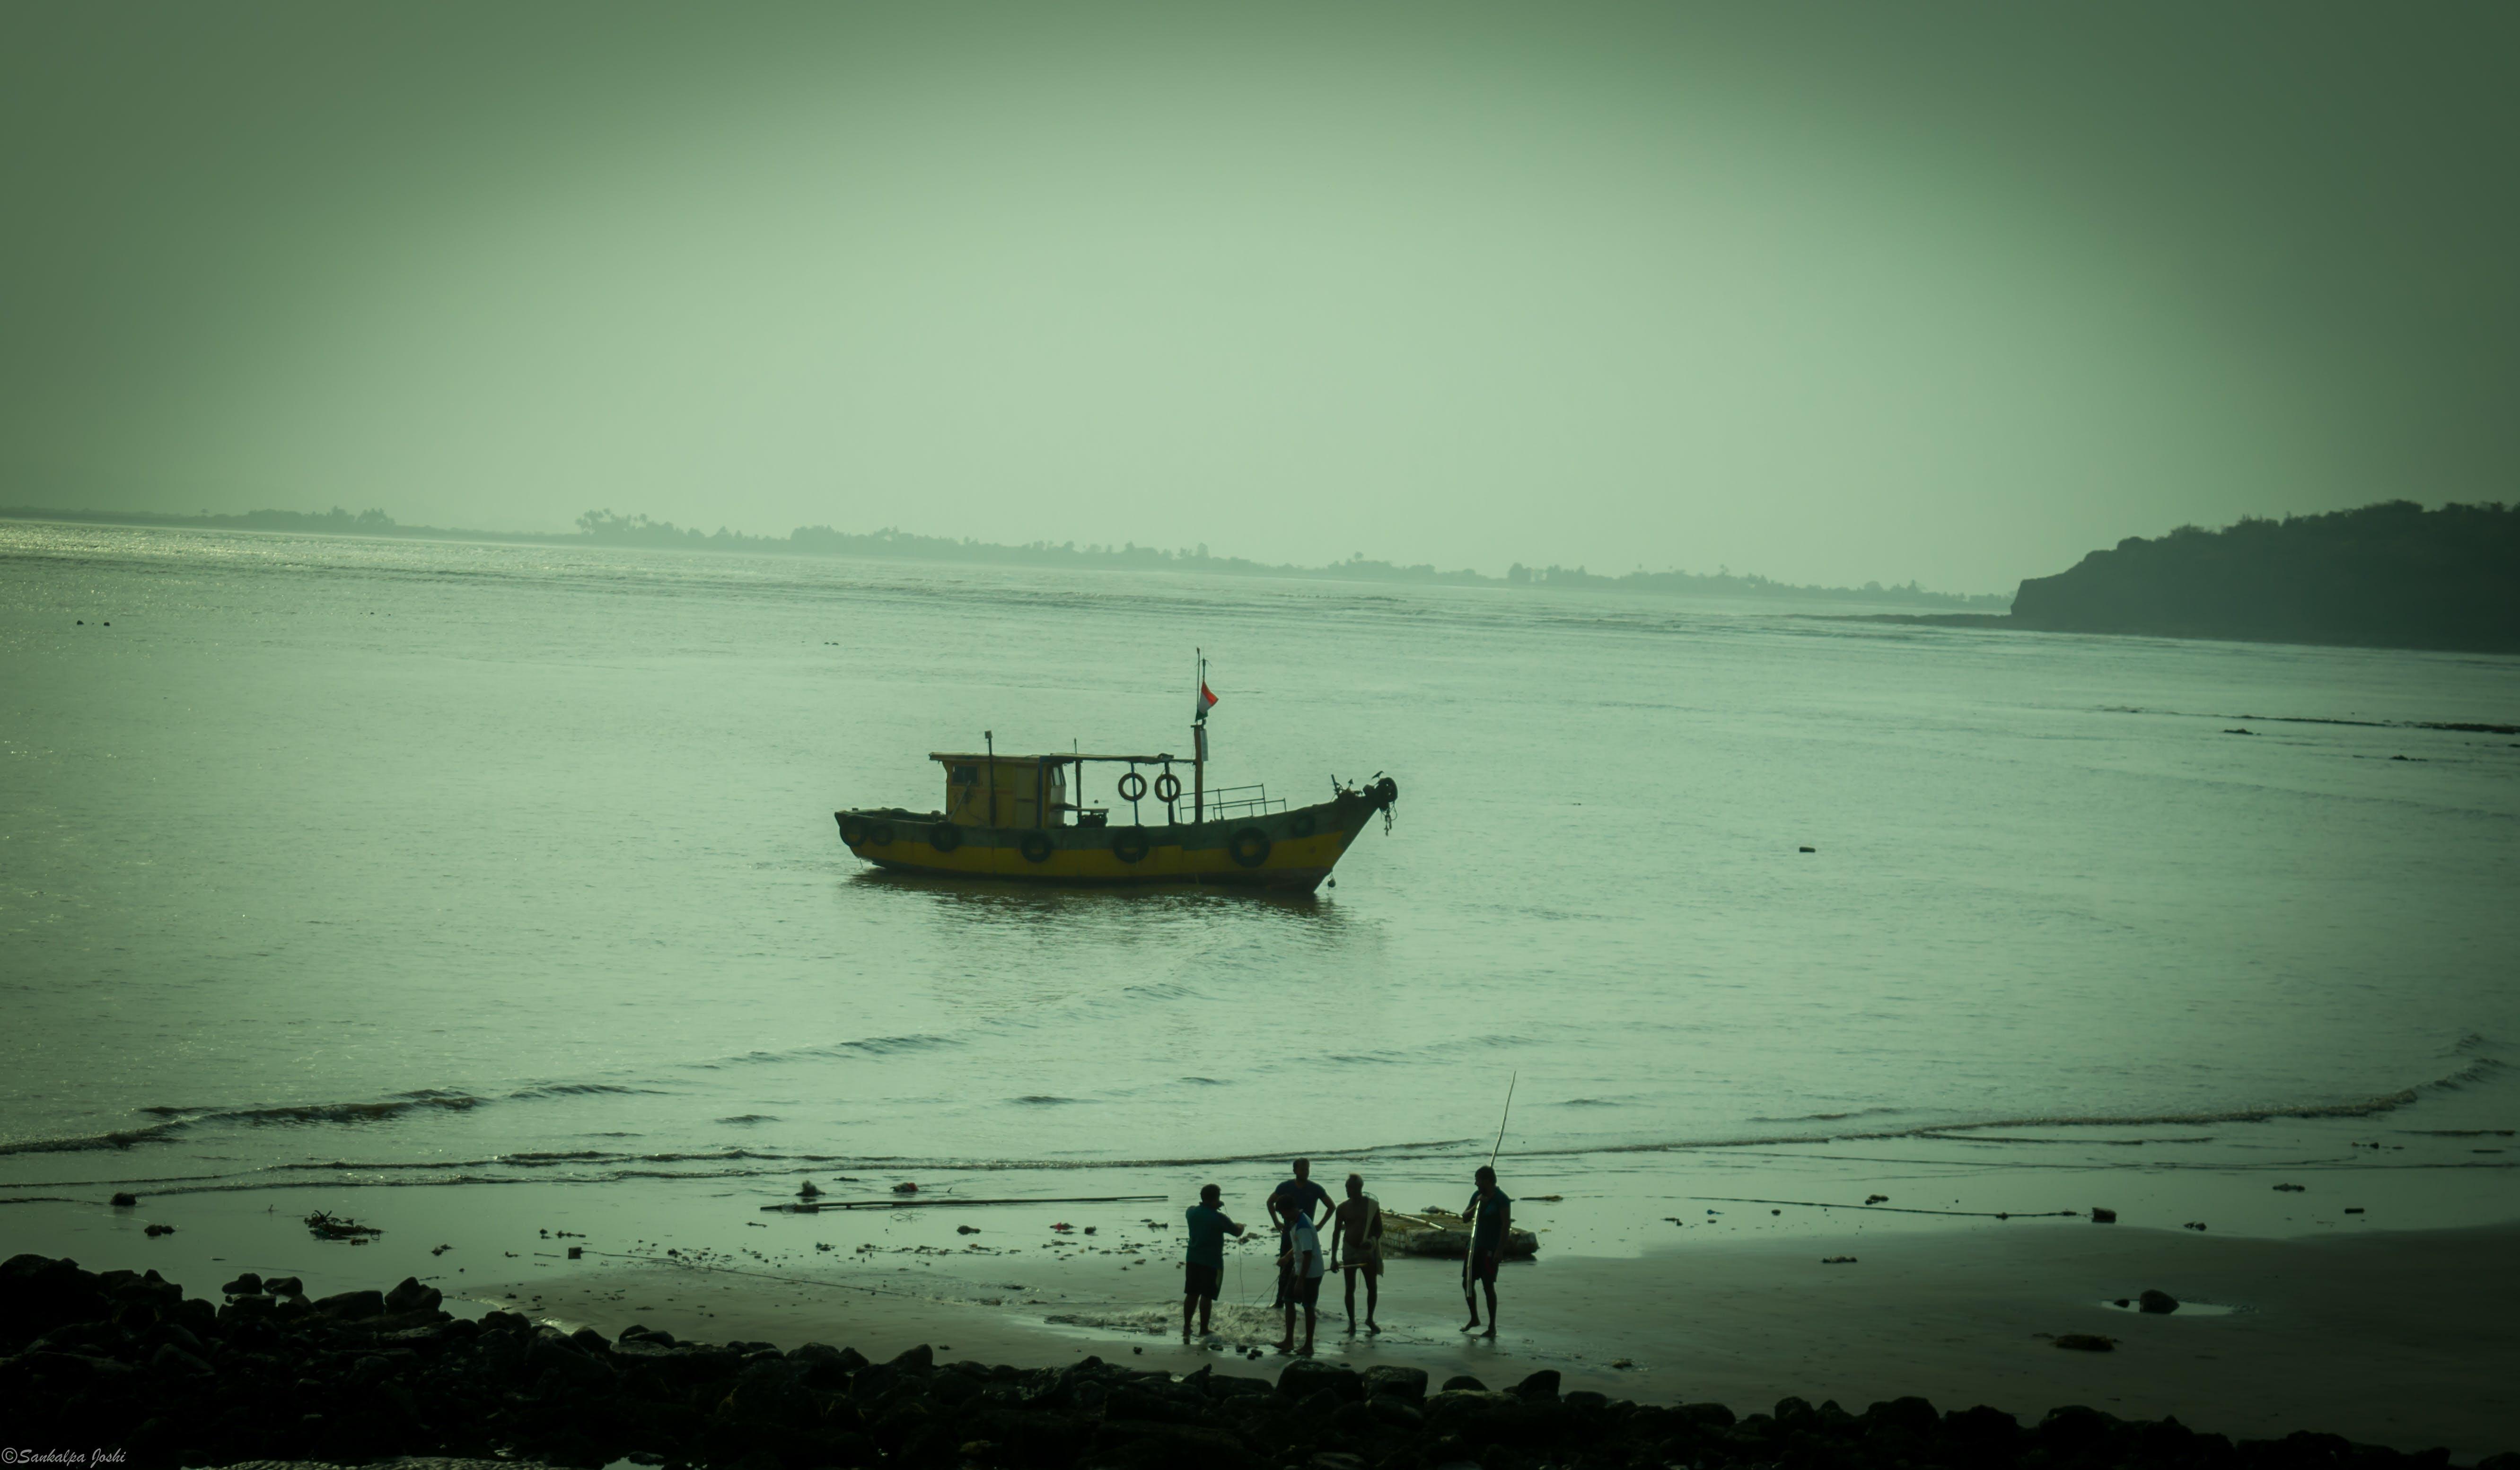 aventura, aventura diària, barca de pesca